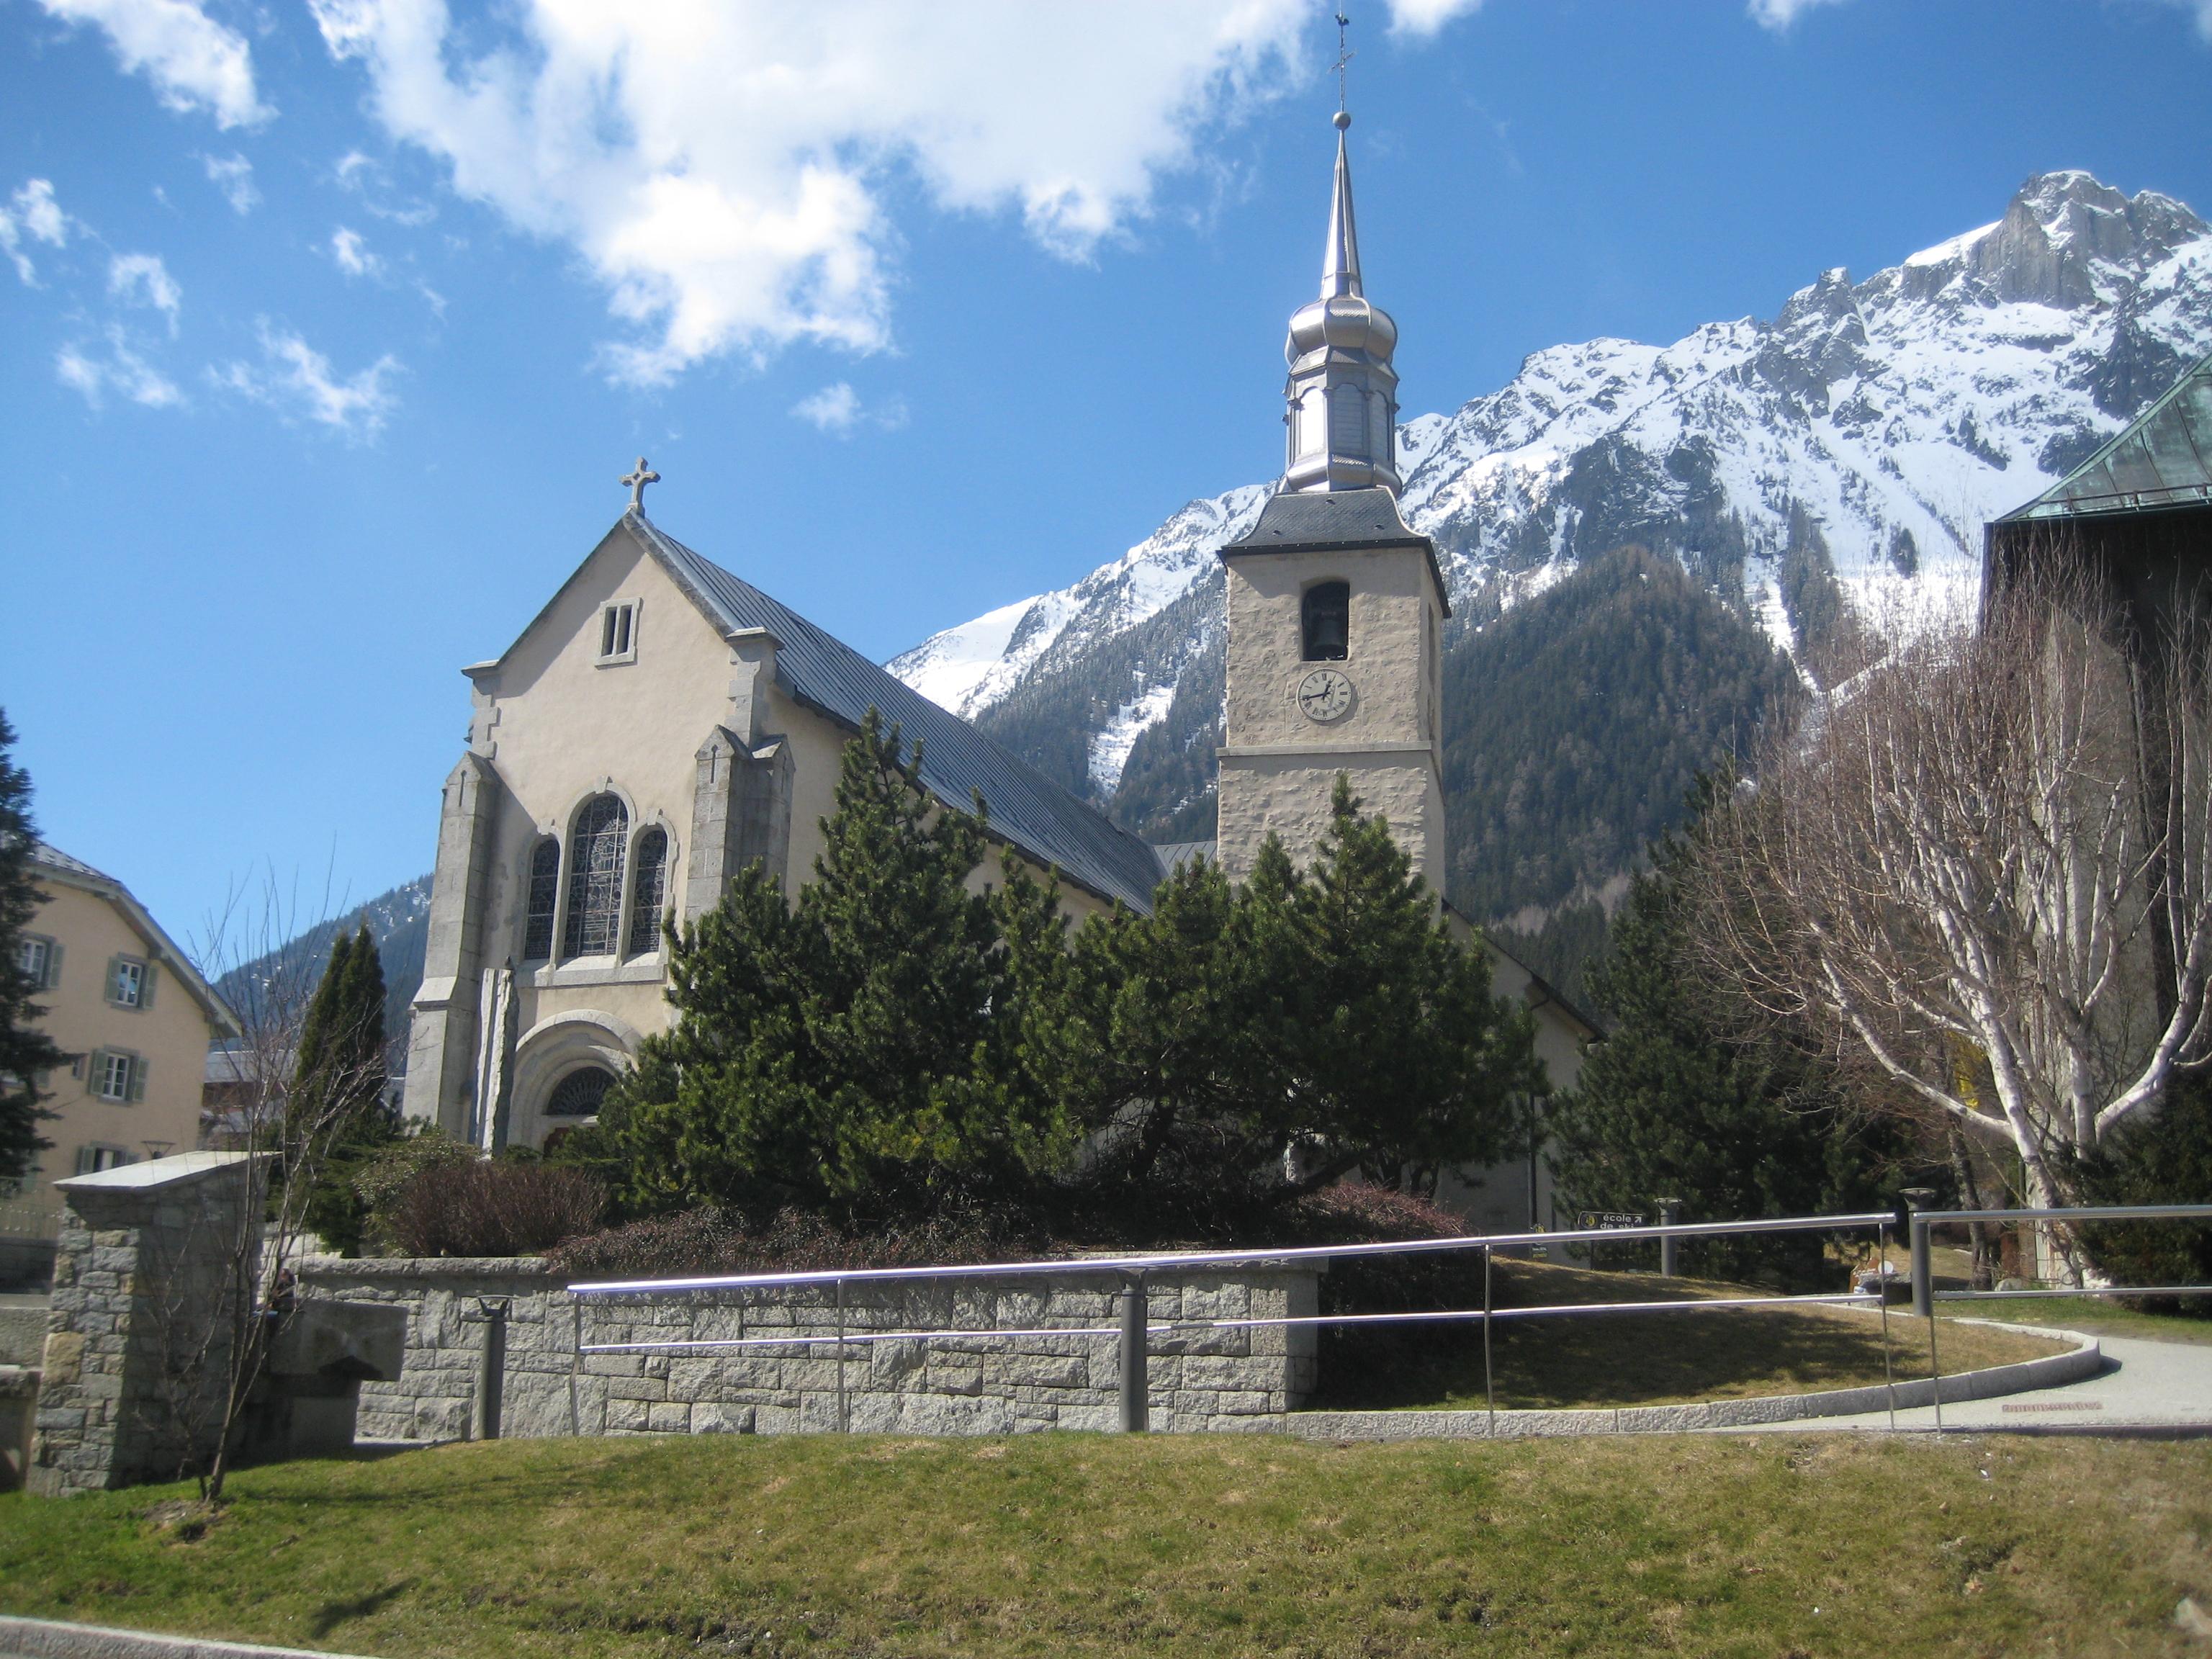 Le célèbre File:Église Saint-Michel de Chamonix-Mont-Blanc.jpg - Wikimedia #JL_36